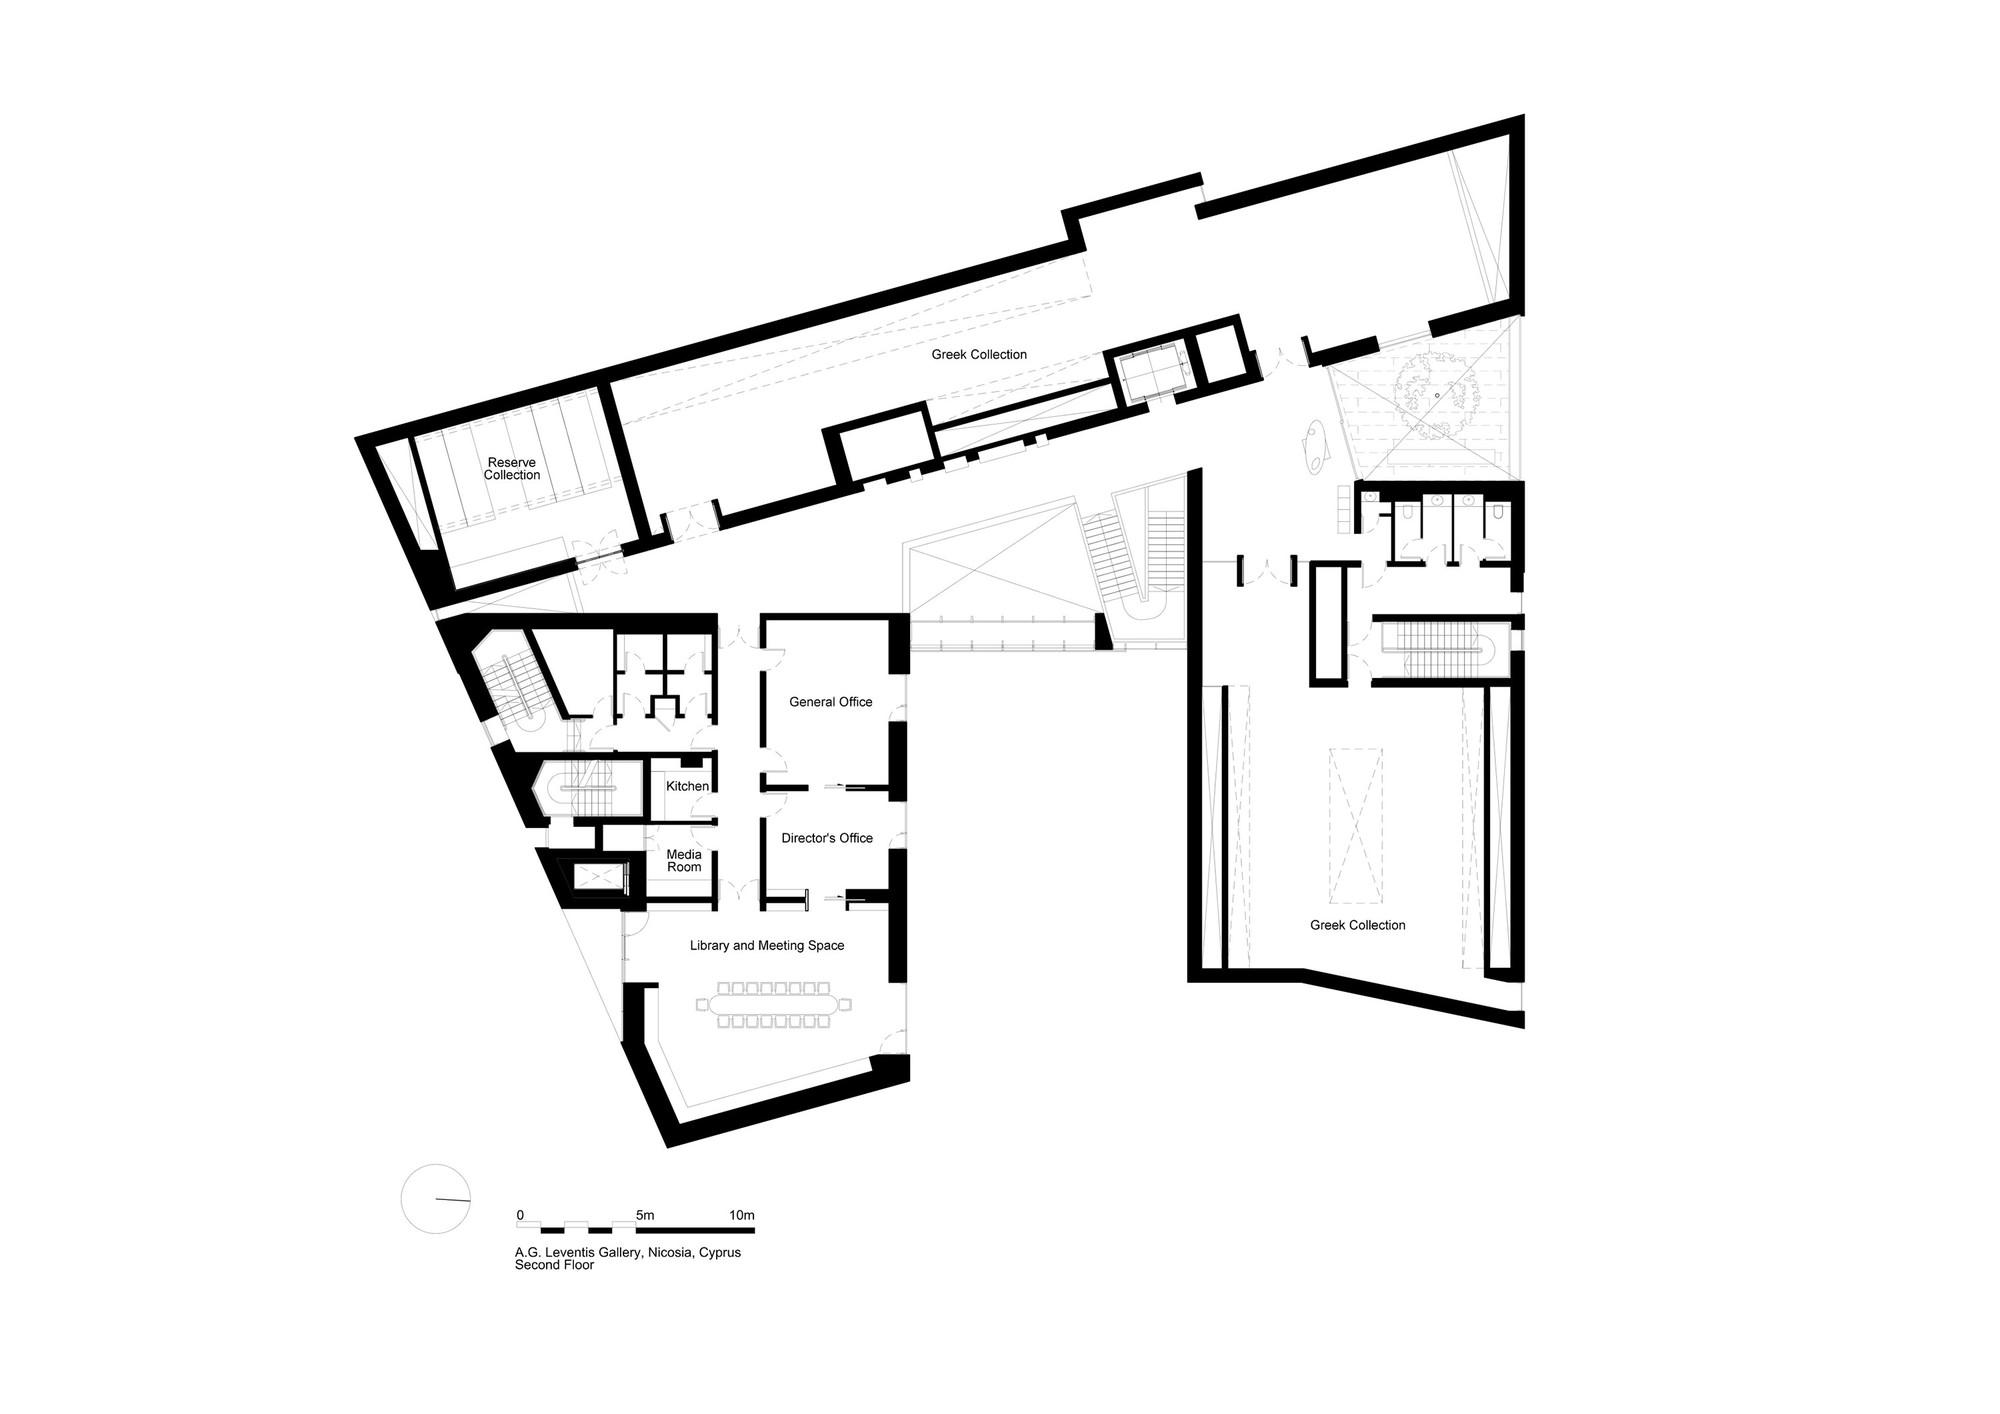 Gallery of leventis art gallery feilden clegg bradley studios 16 - Big floor plans gallery ...